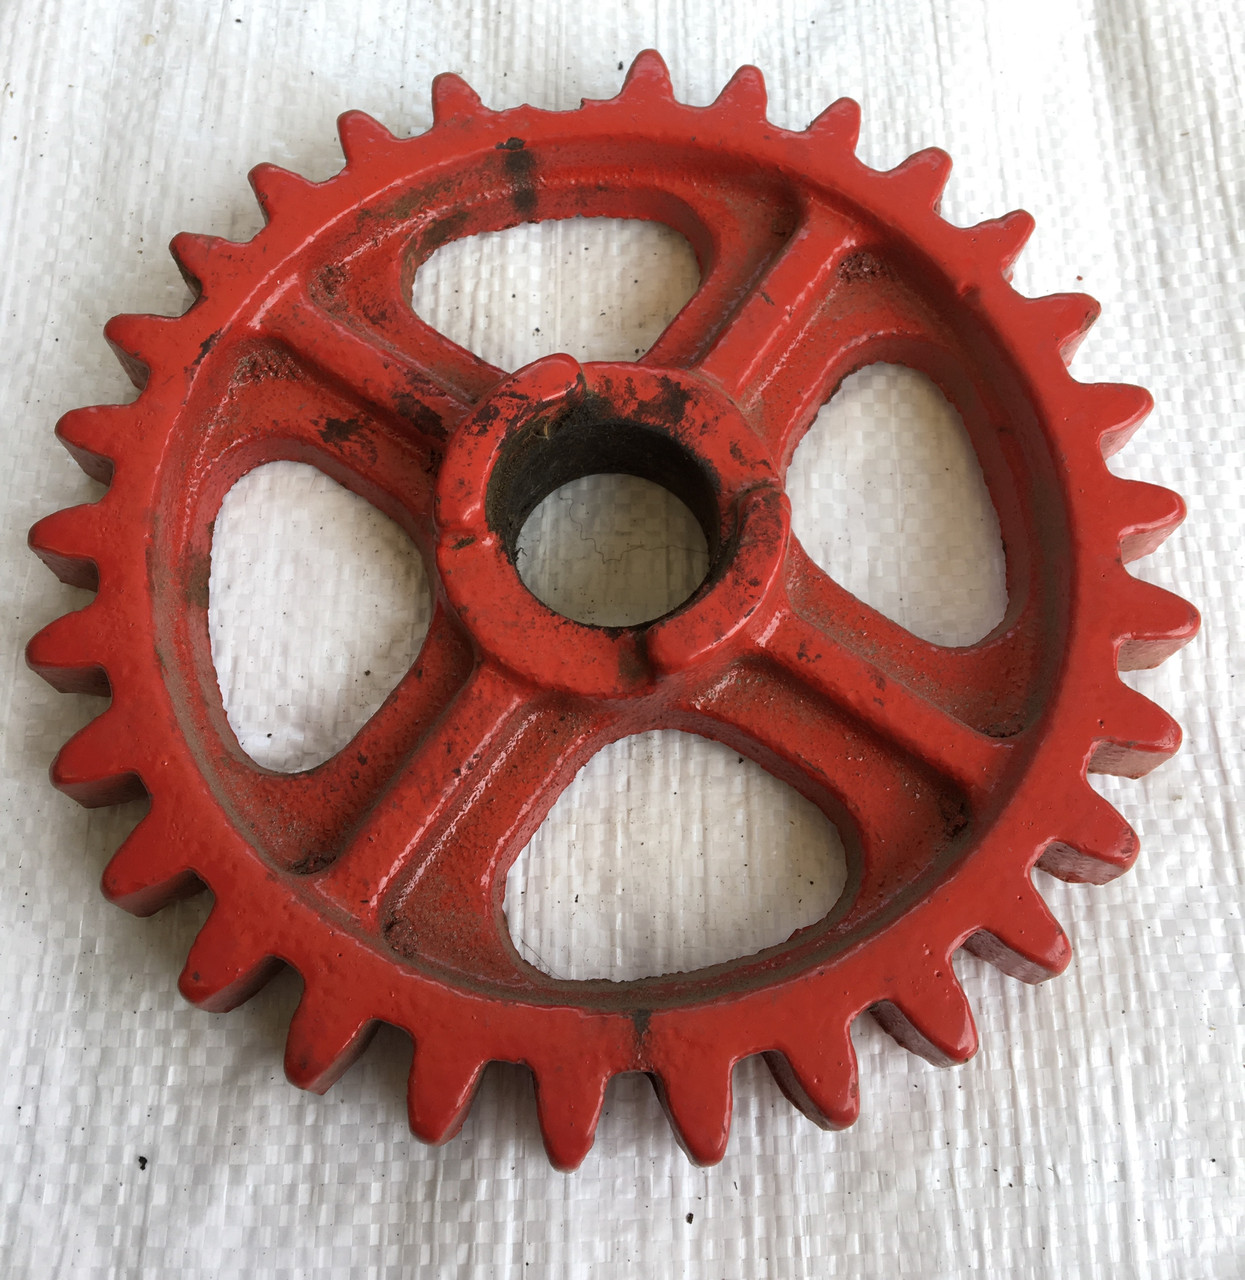 ЗУБЧАТКА РЕДУКТОРА  (колесо зубчатое) СЗГ 00.119 (СЗТ)  z=30, d=35, D=190